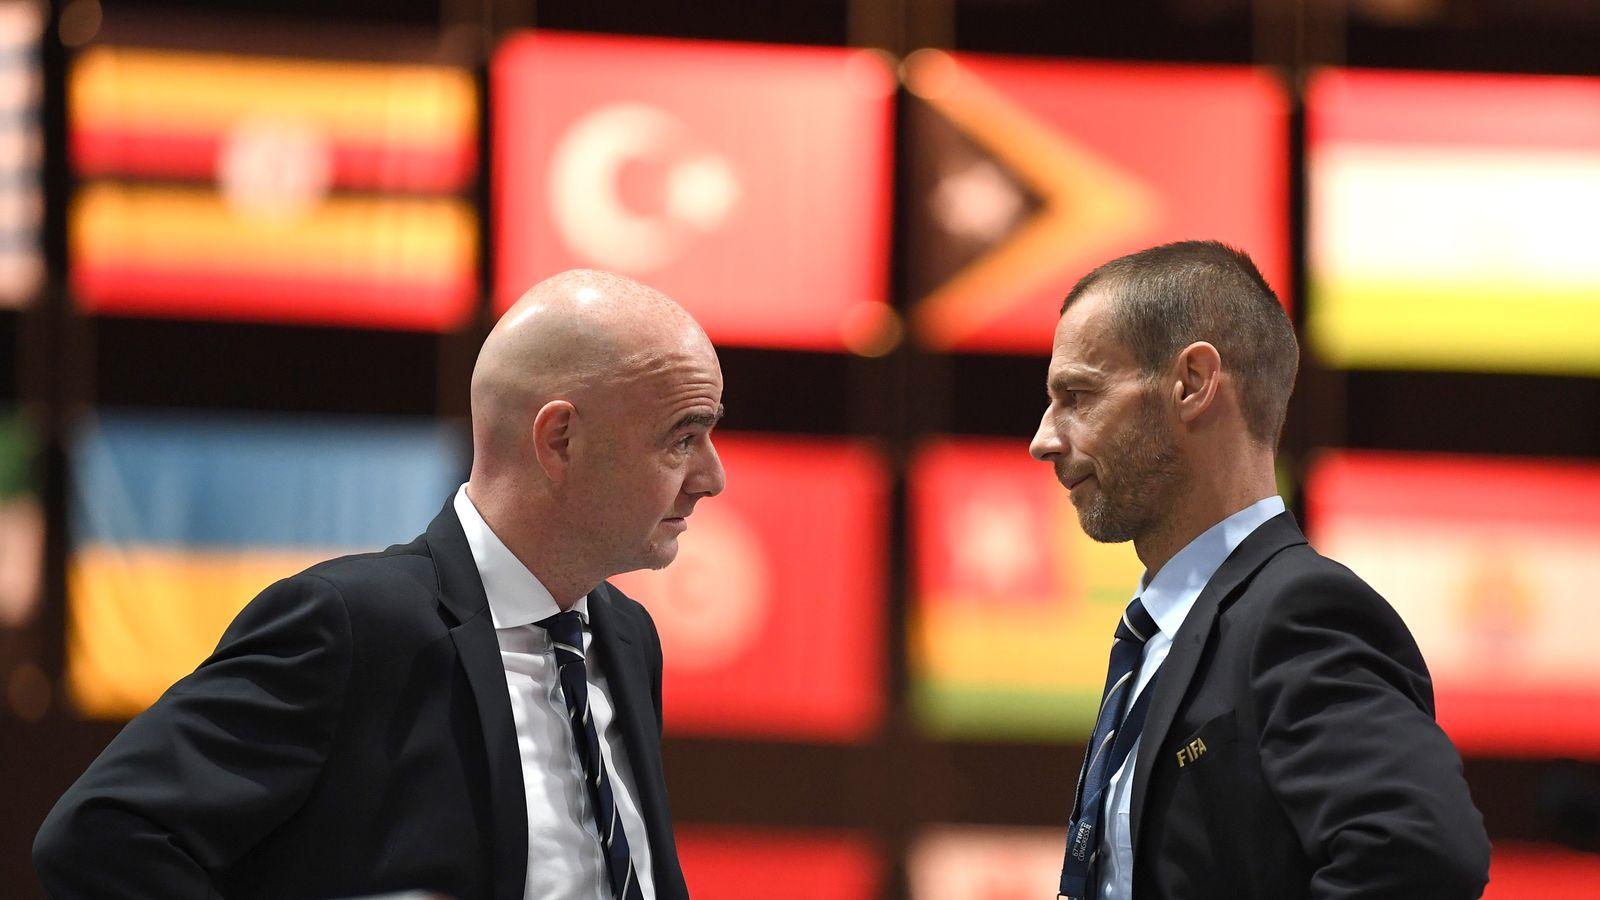 67th FIFA Congress